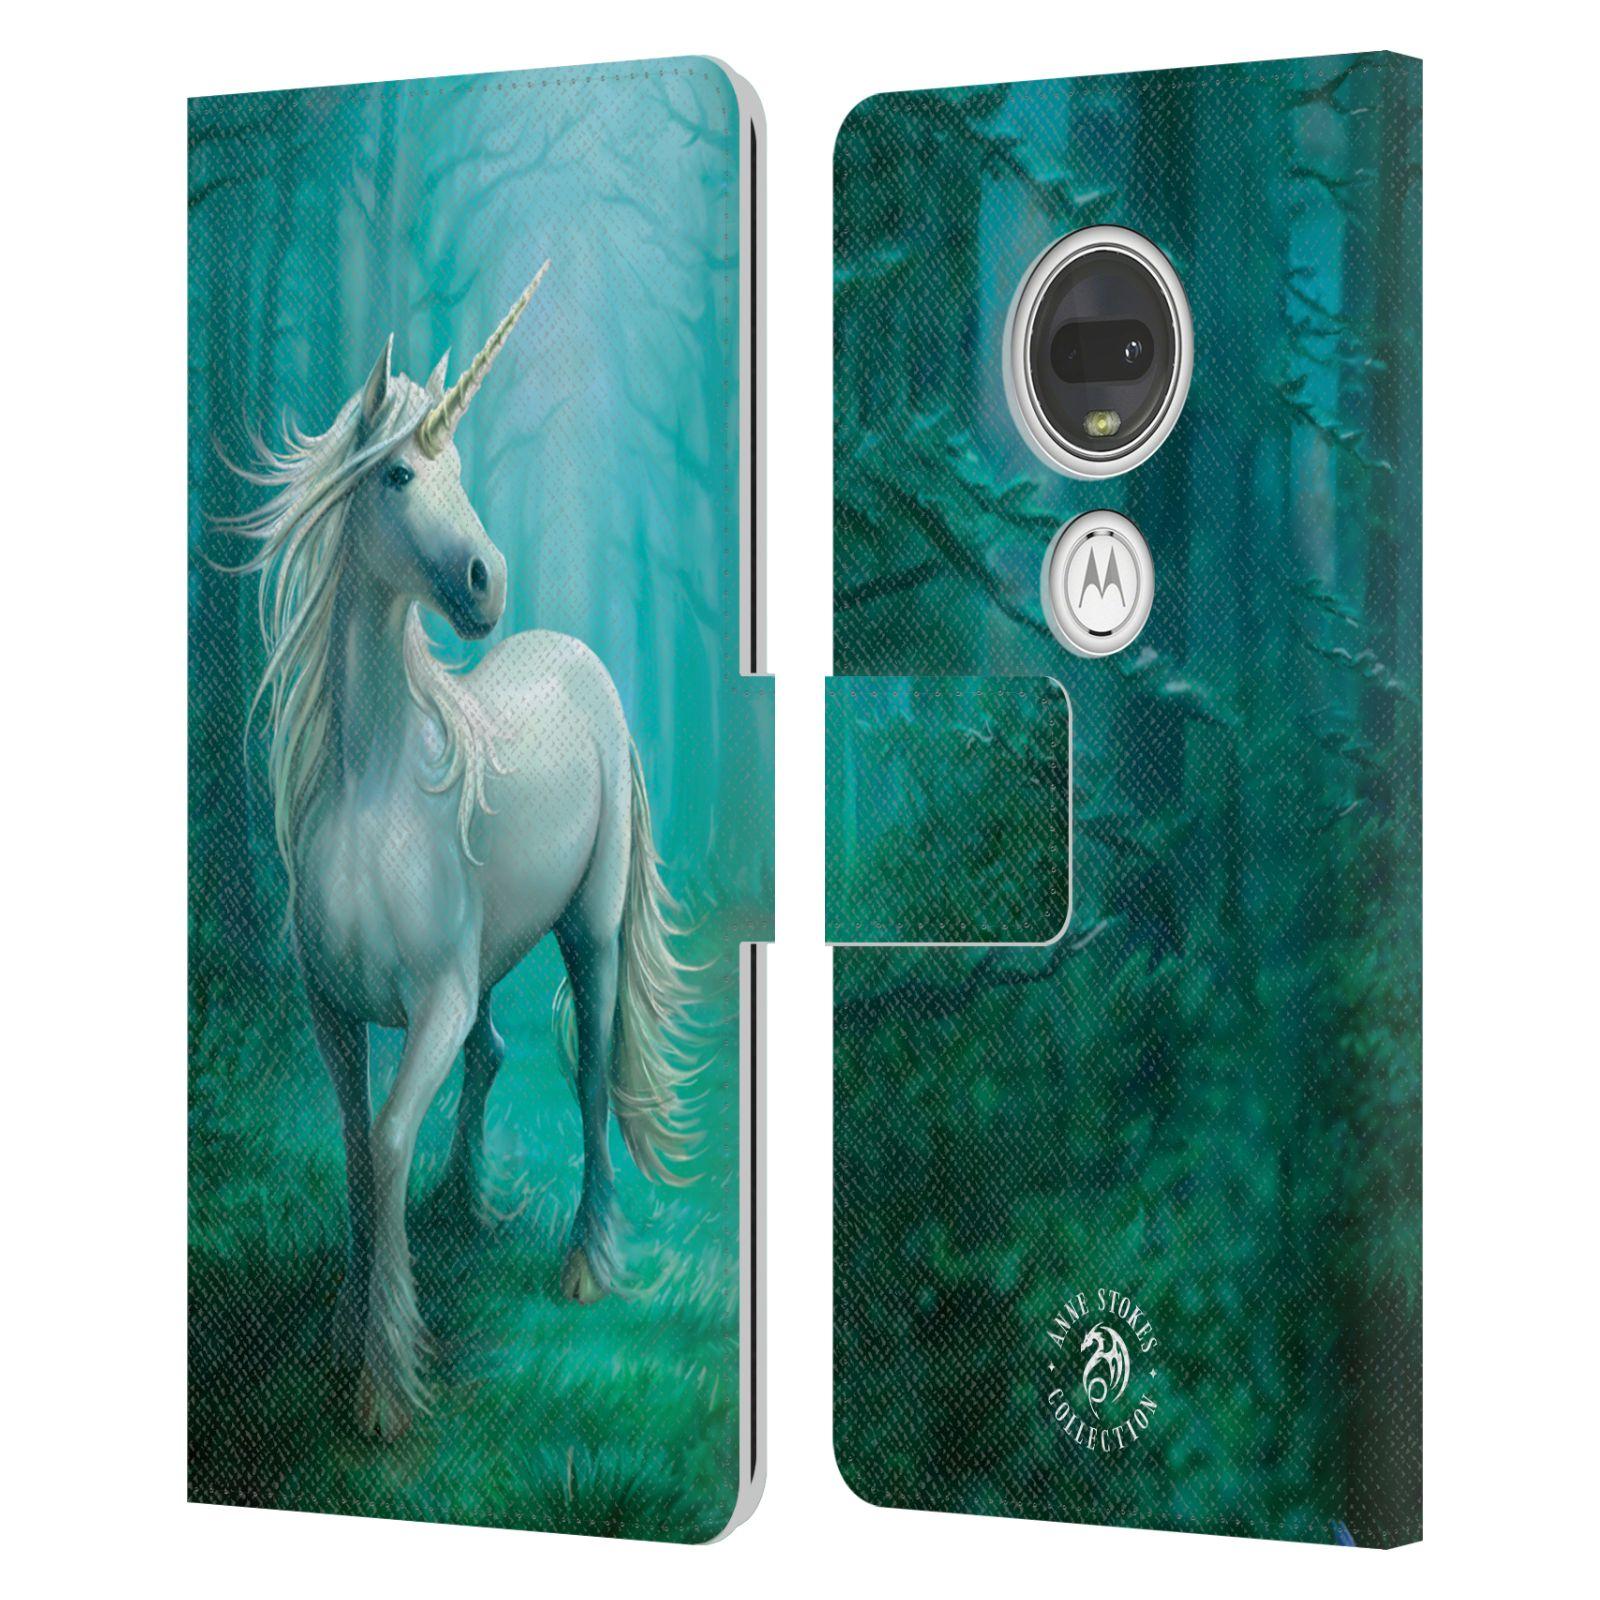 Pouzdro na mobil Motorola Moto G7 - Head Case - fantasy - jednorožec v lese